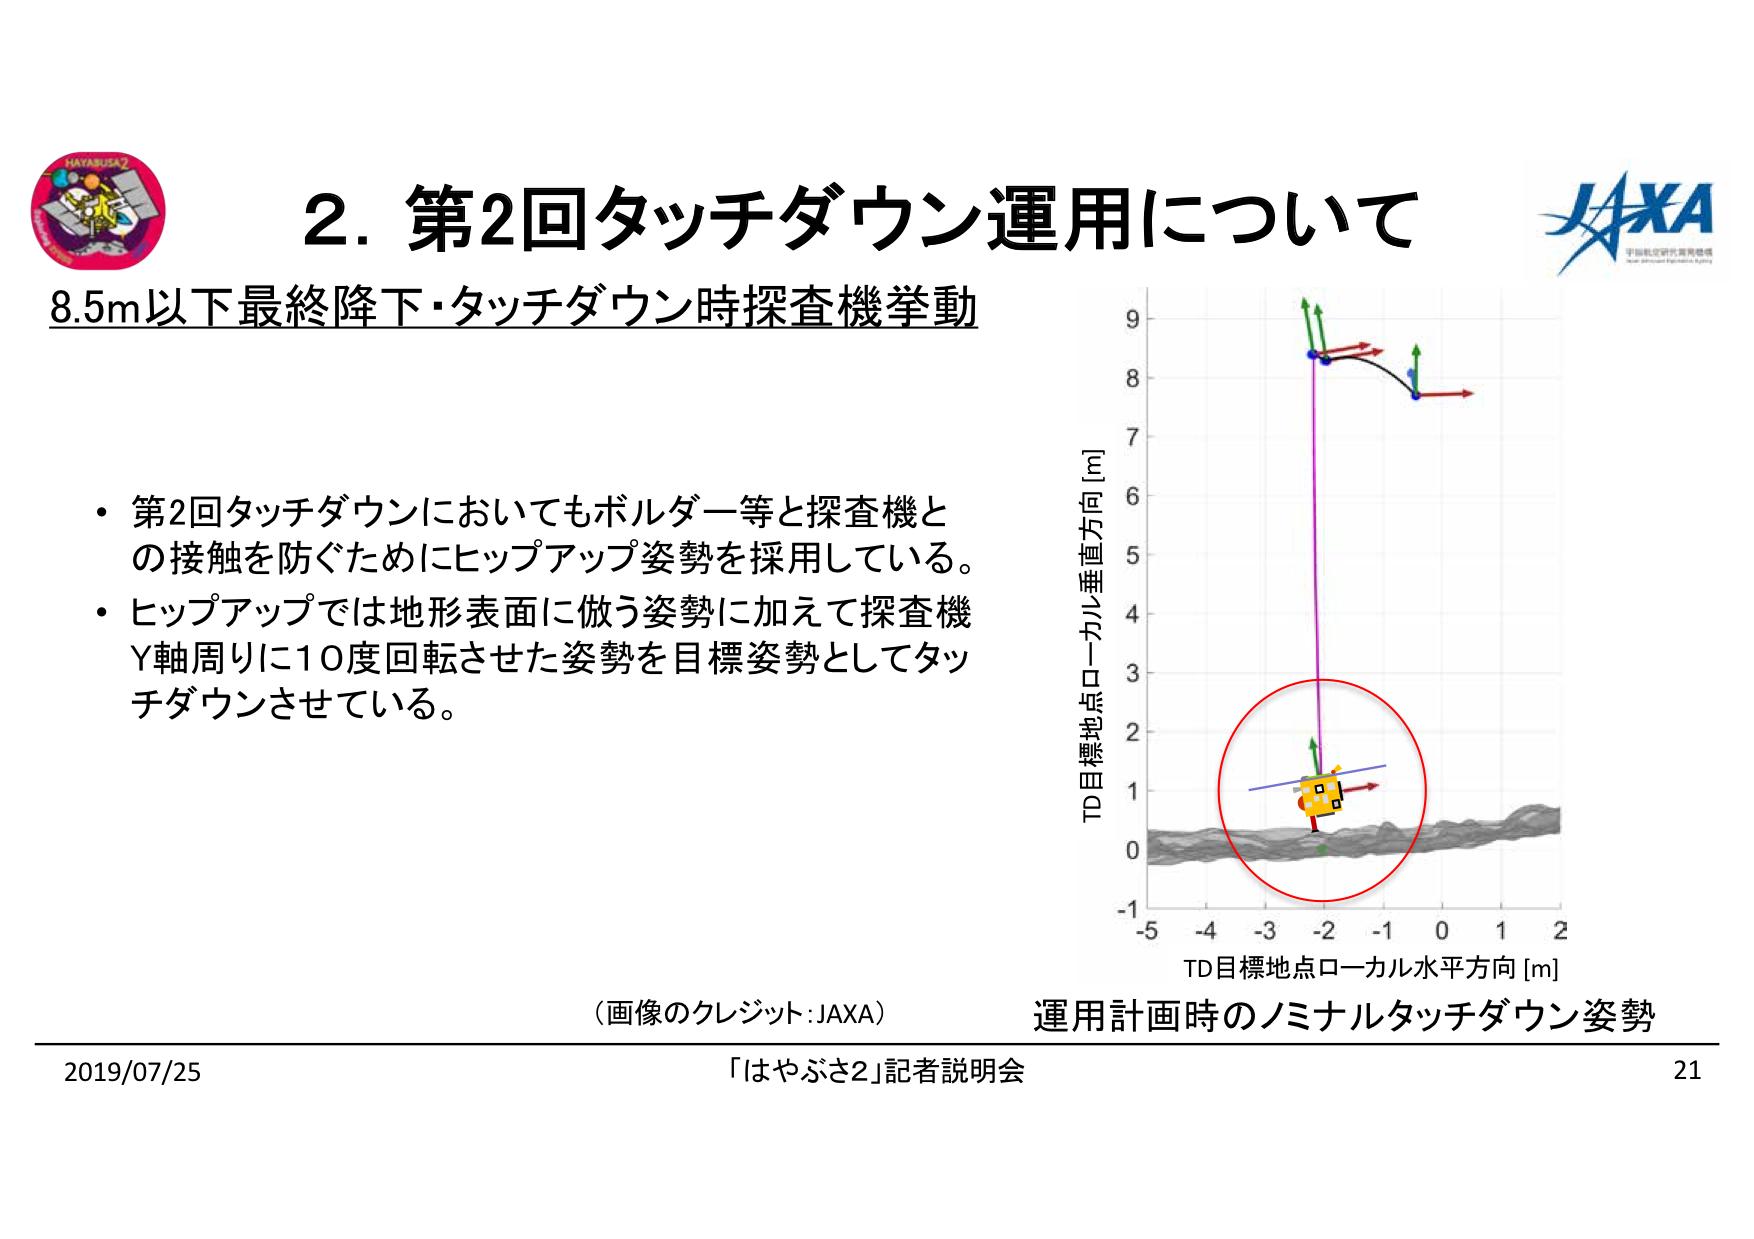 f:id:Imamura:20190725151251p:plain